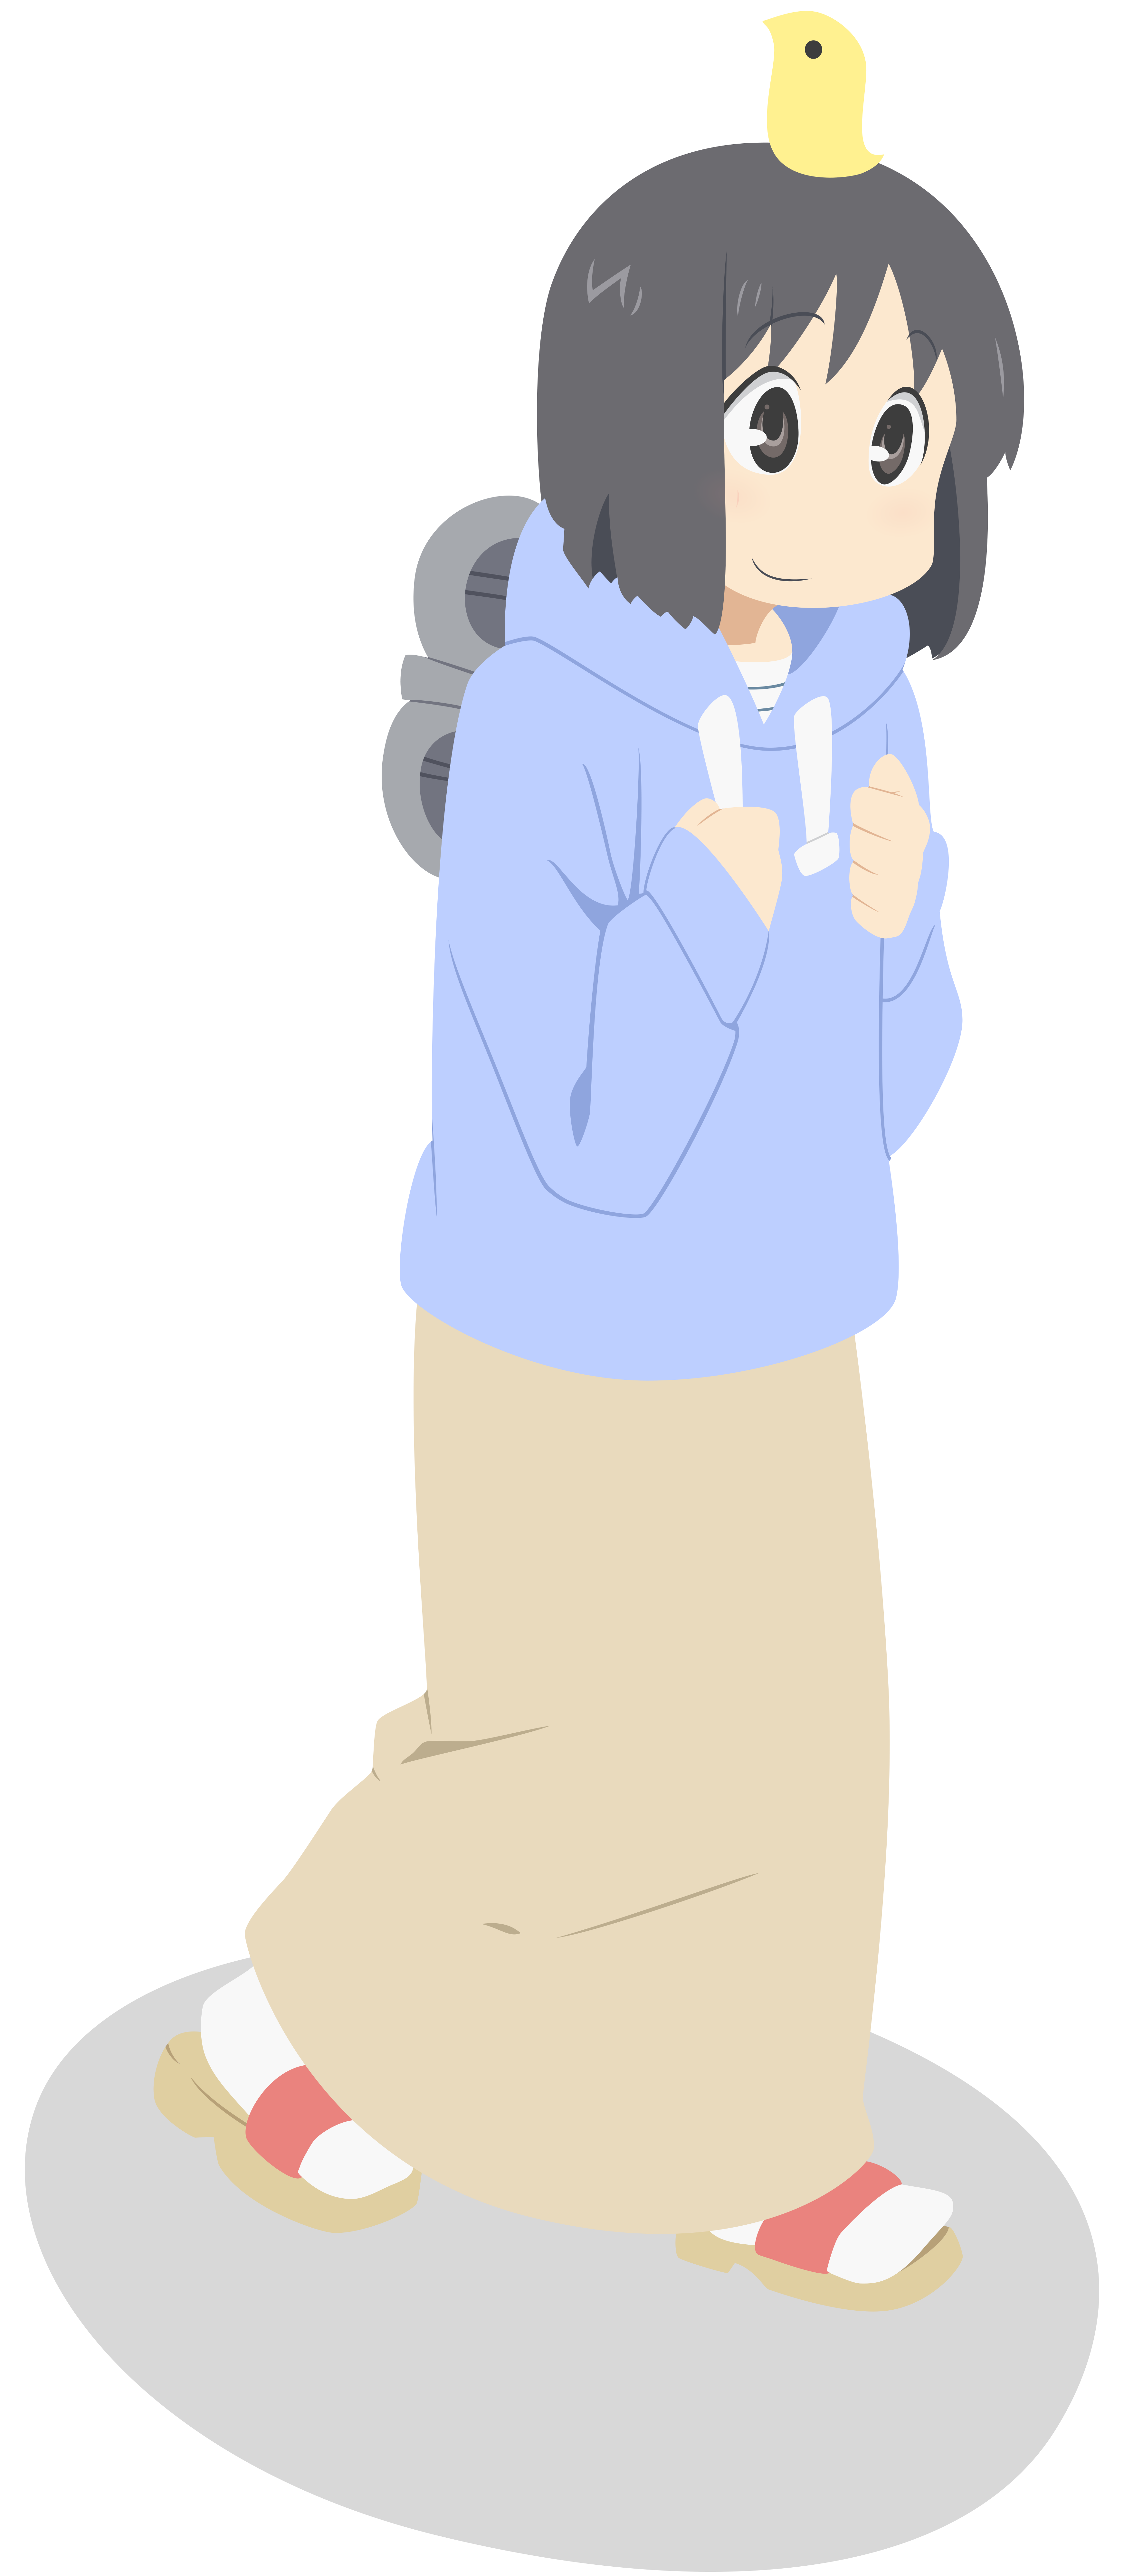 Shinonome Nano (2) by Dekodere on DeviantArt